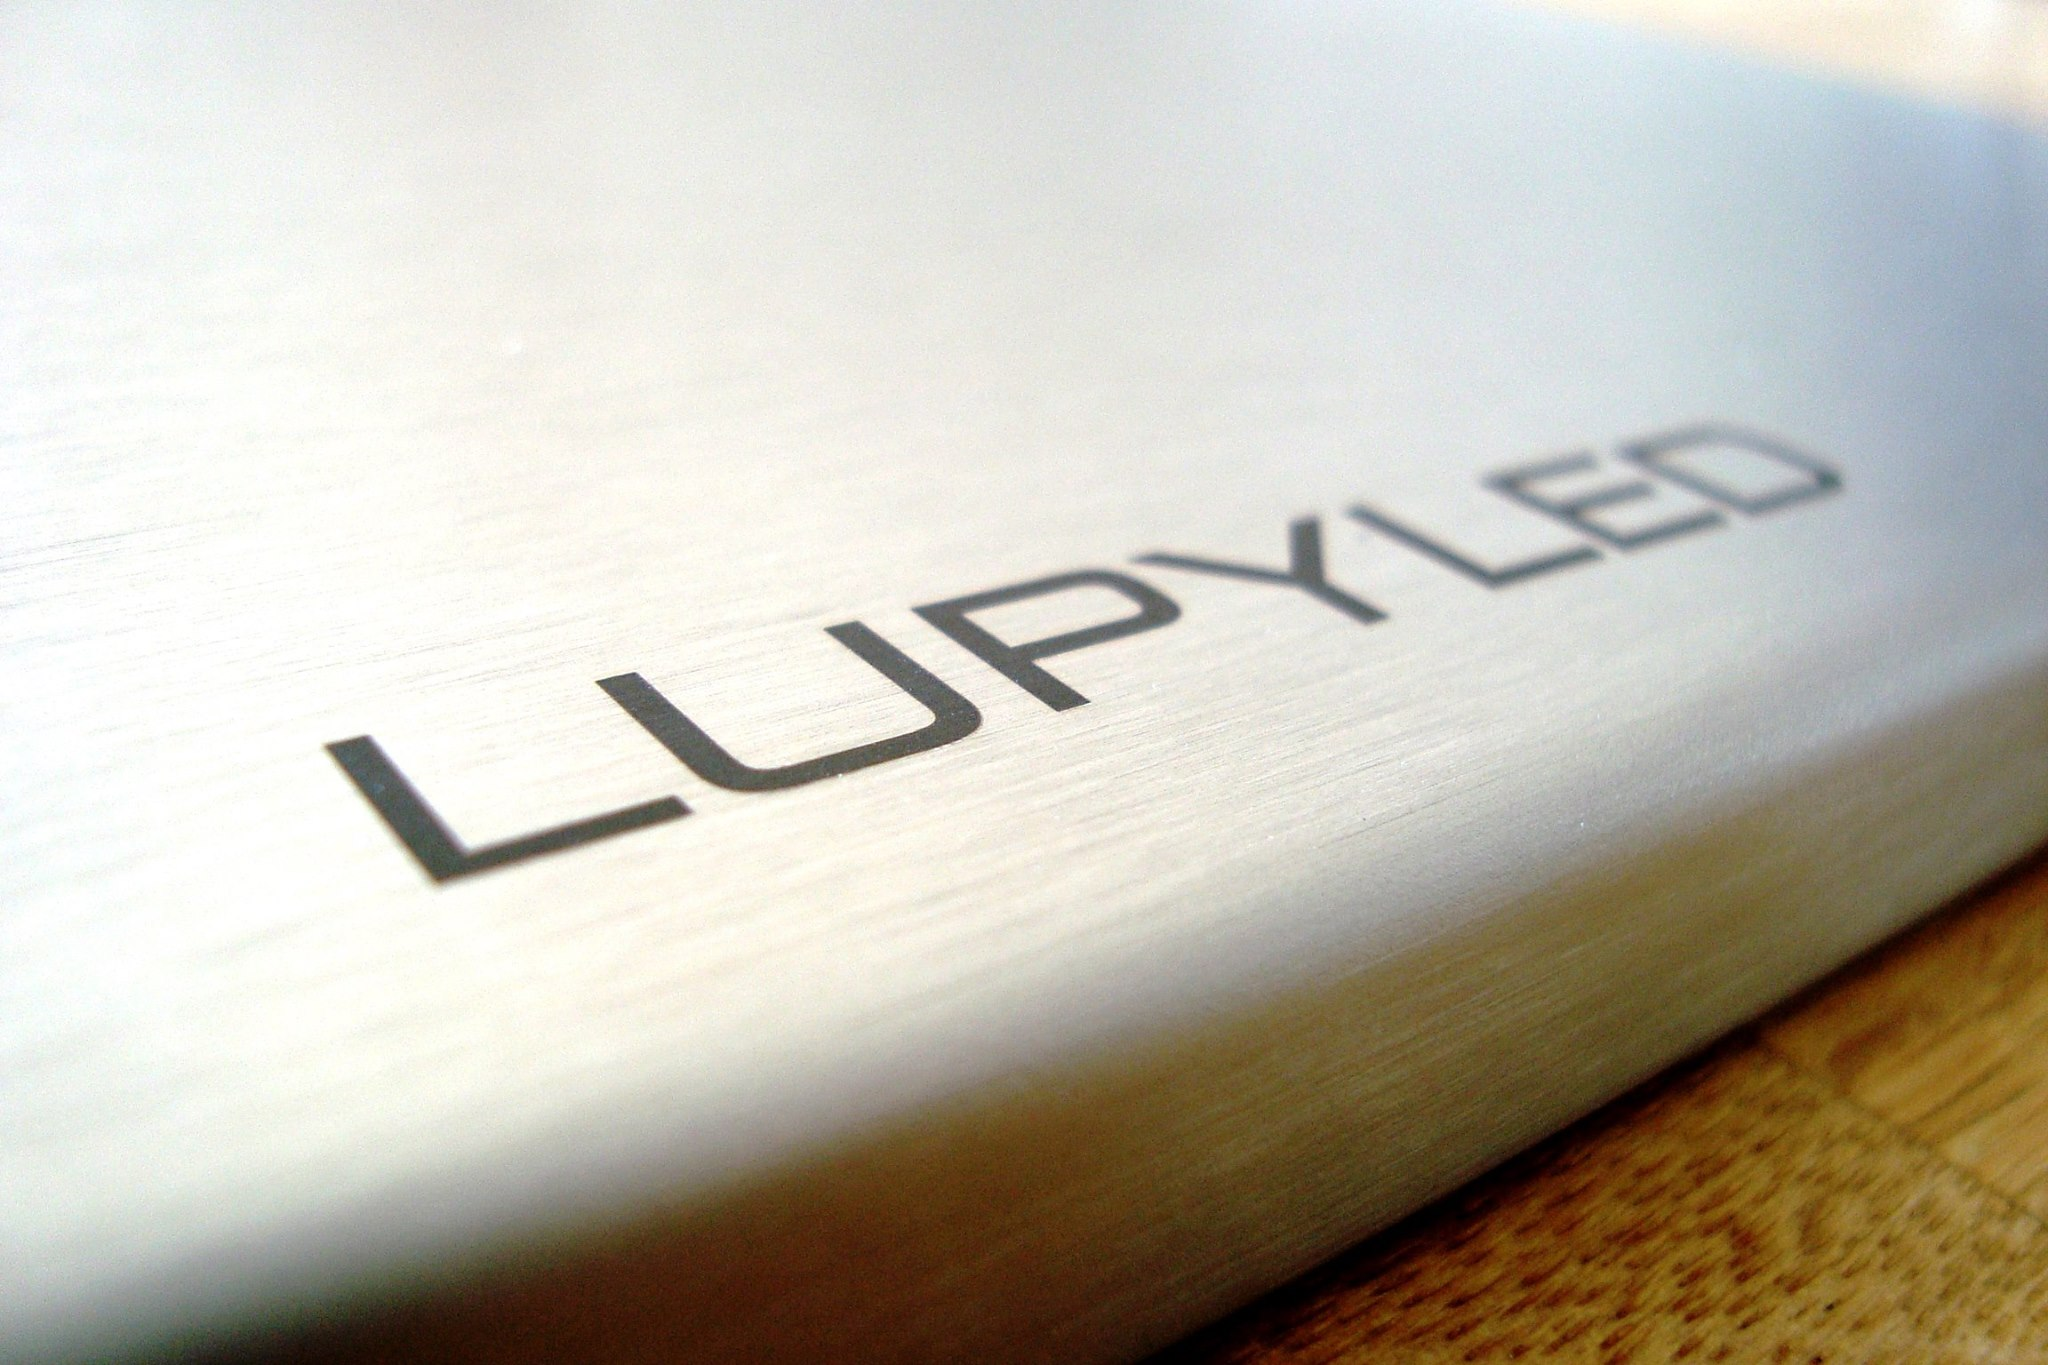 LUPY_03.jpg